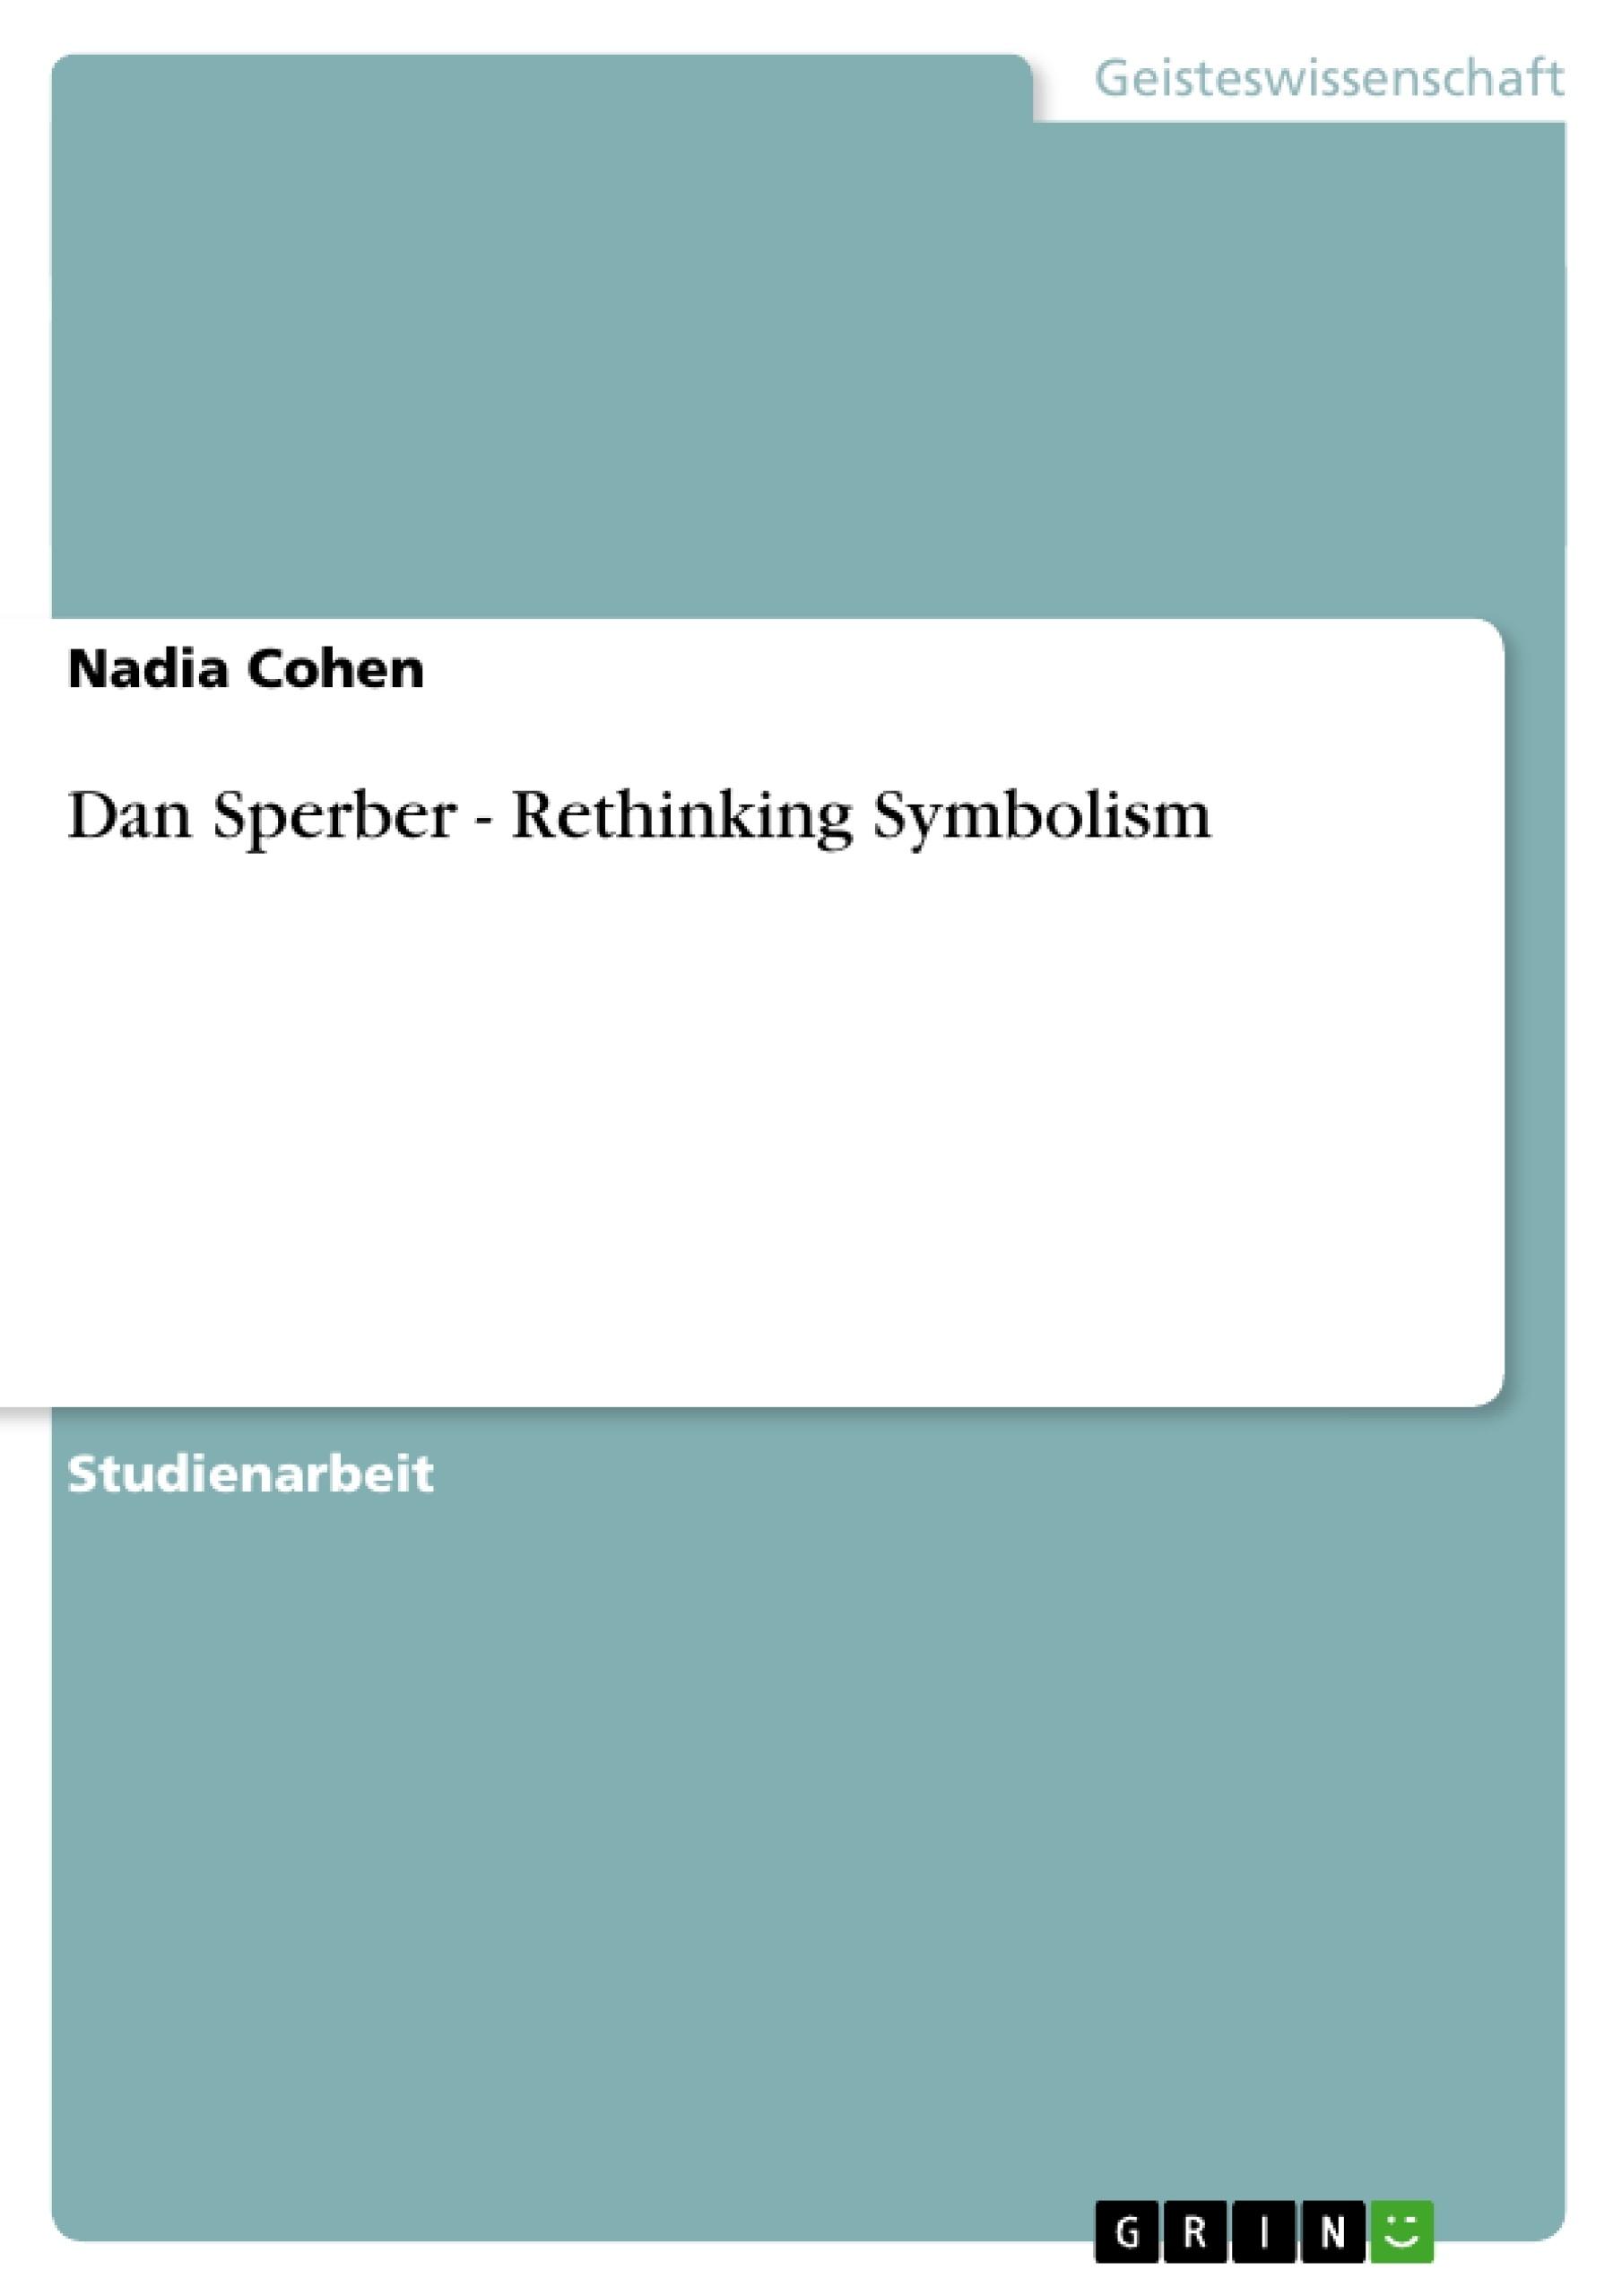 Titel: Dan Sperber - Rethinking Symbolism